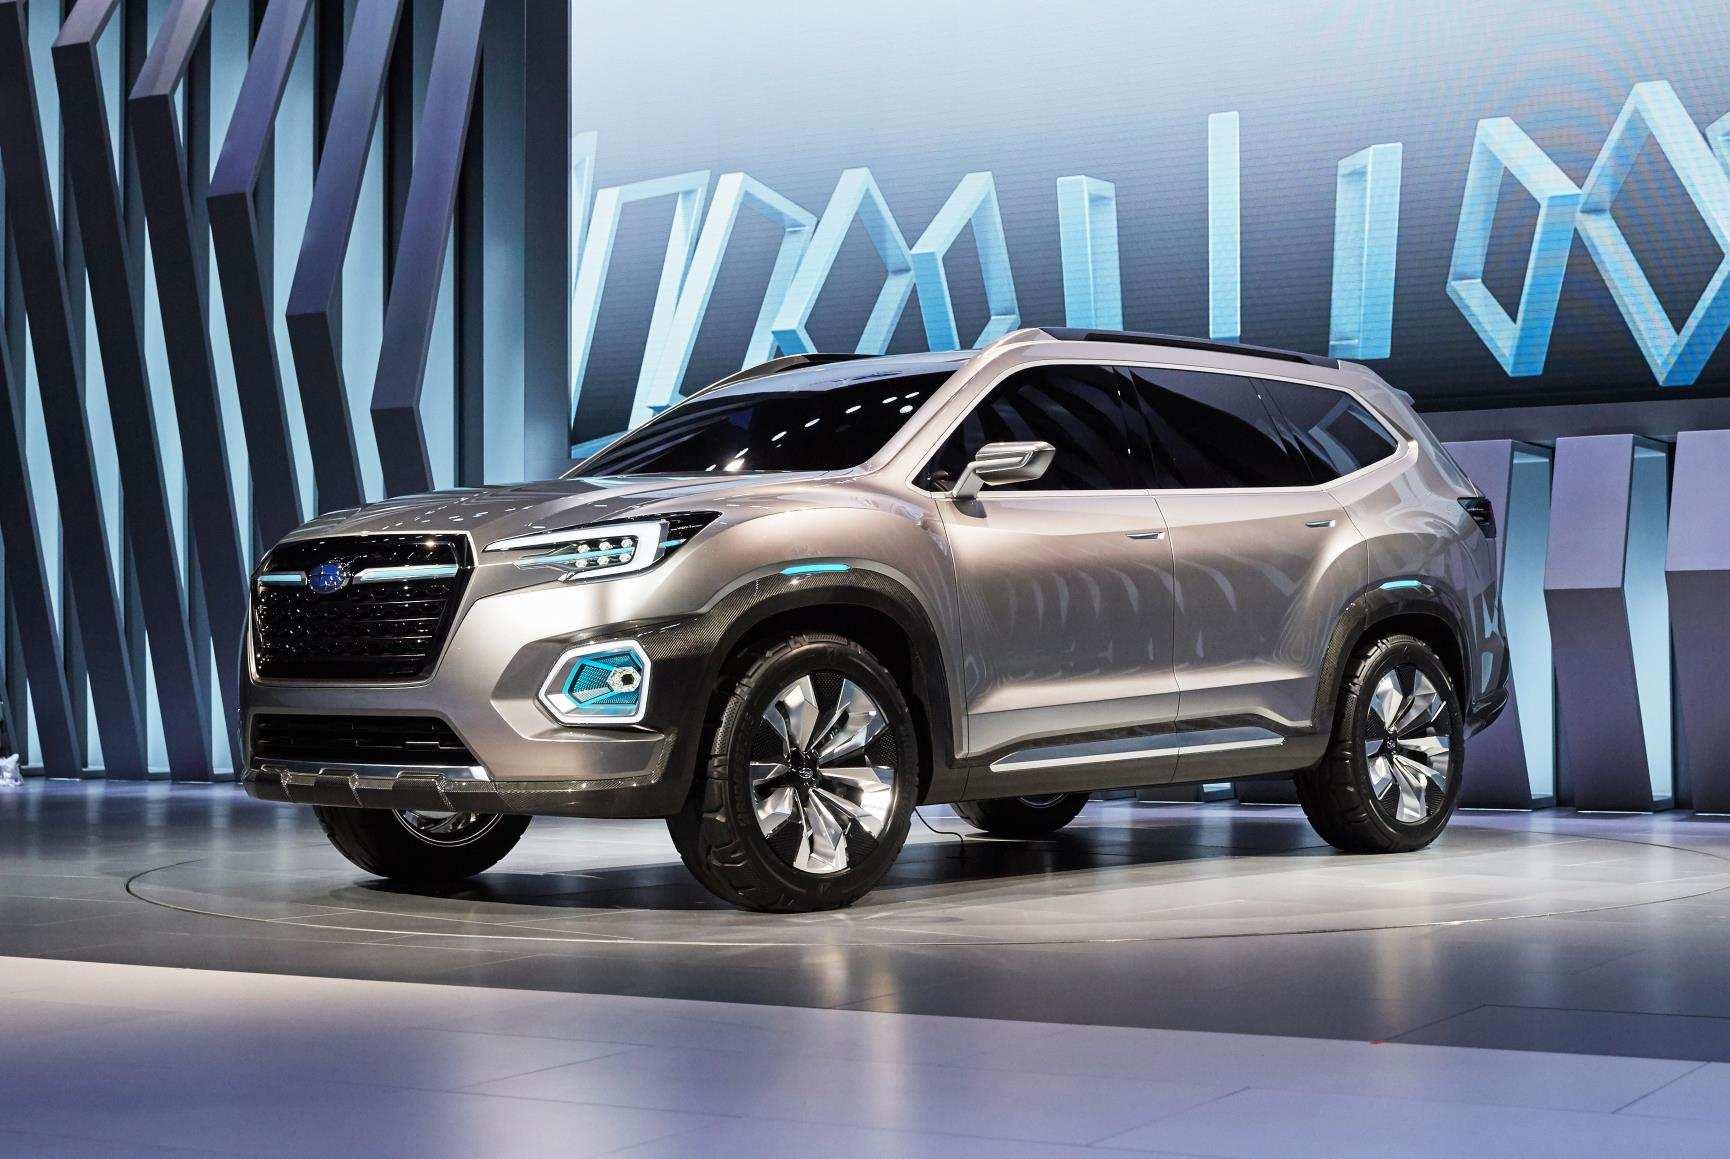 30 New 2019 Subaru Suv Release Date by 2019 Subaru Suv